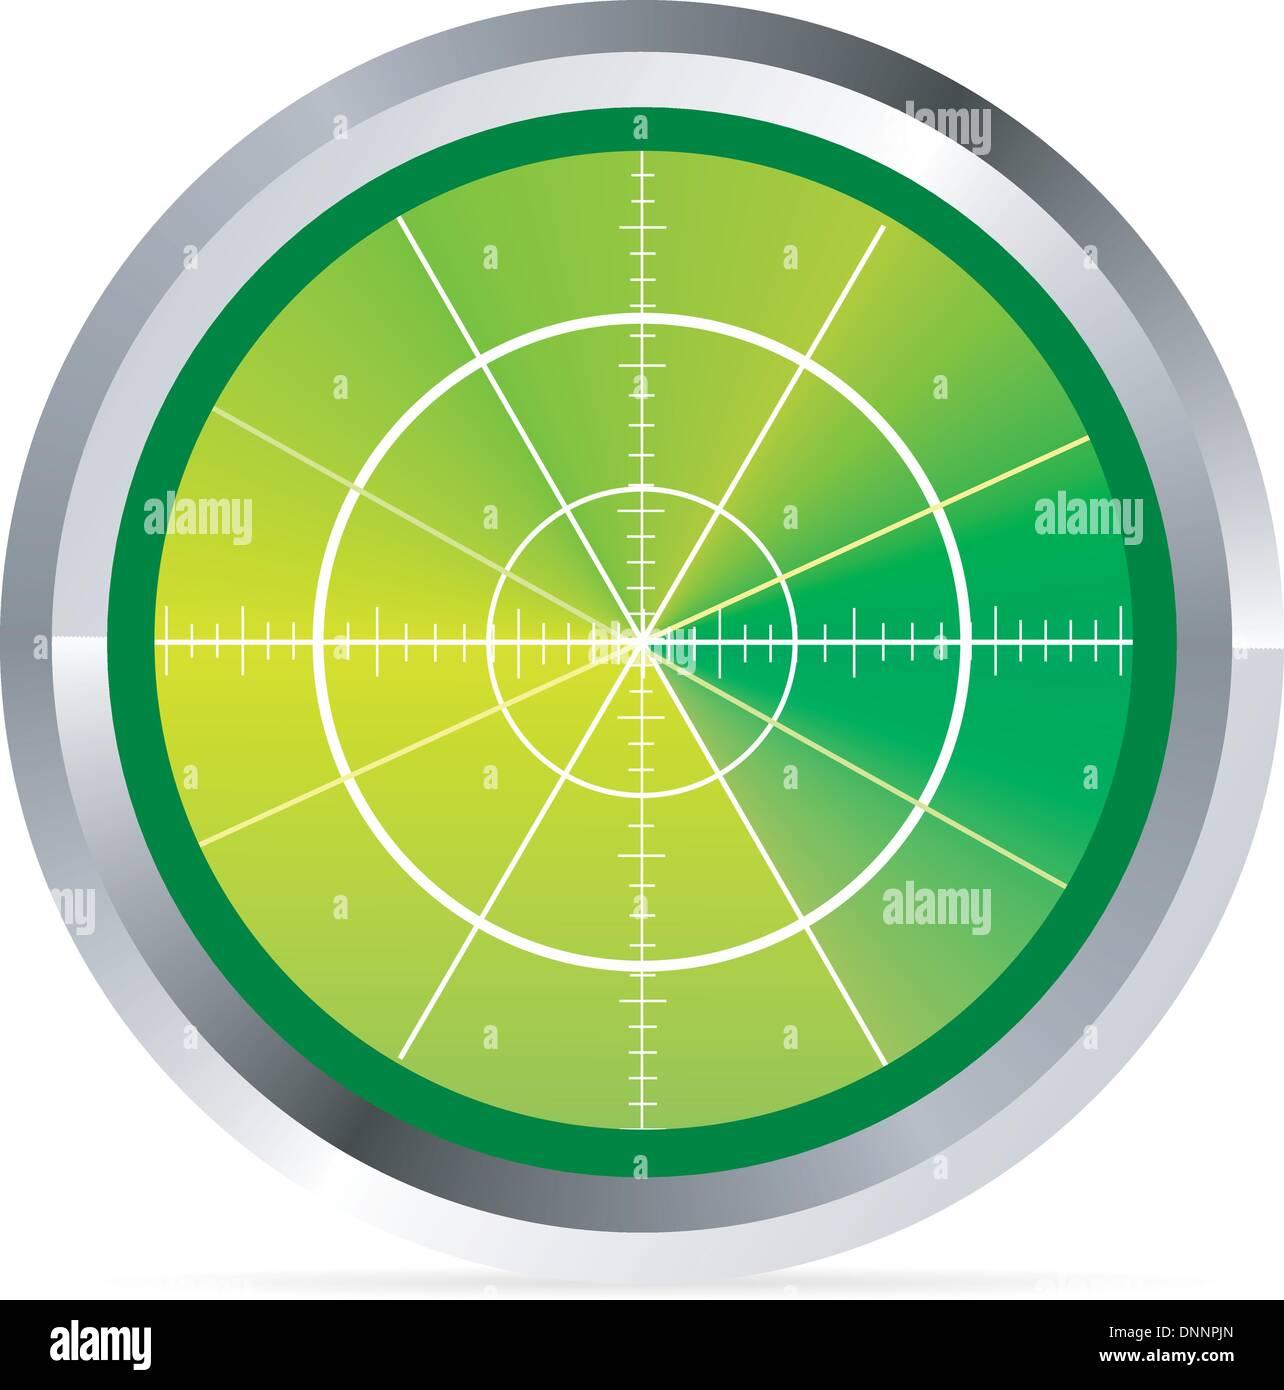 Illustration of radar or oscilloscope monitor - Stock Image